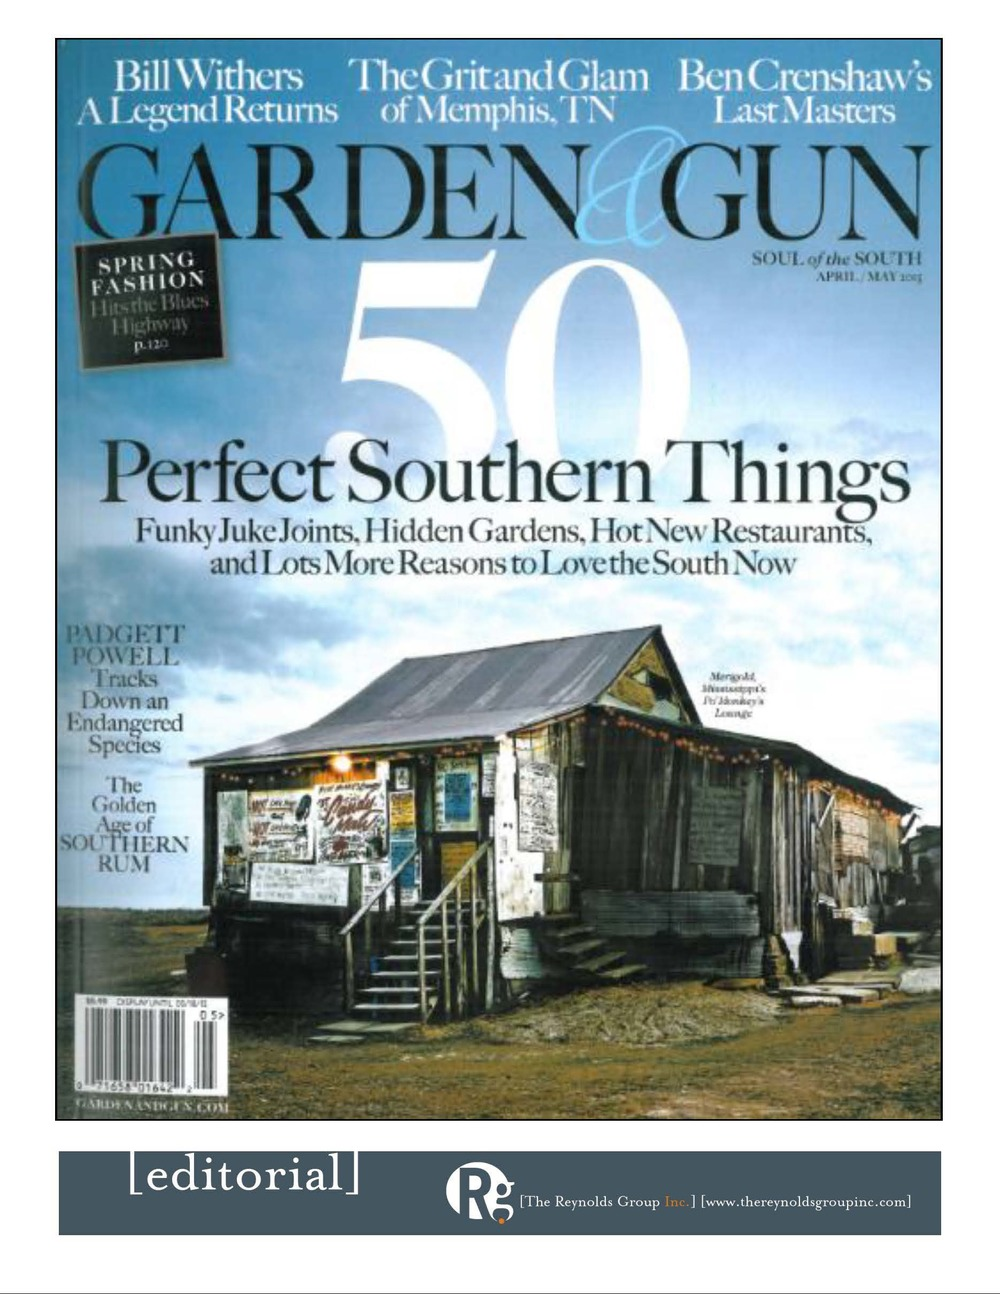 AprilMay2015.RoottoLeaf.Garden&Gun_Page_1.jpg